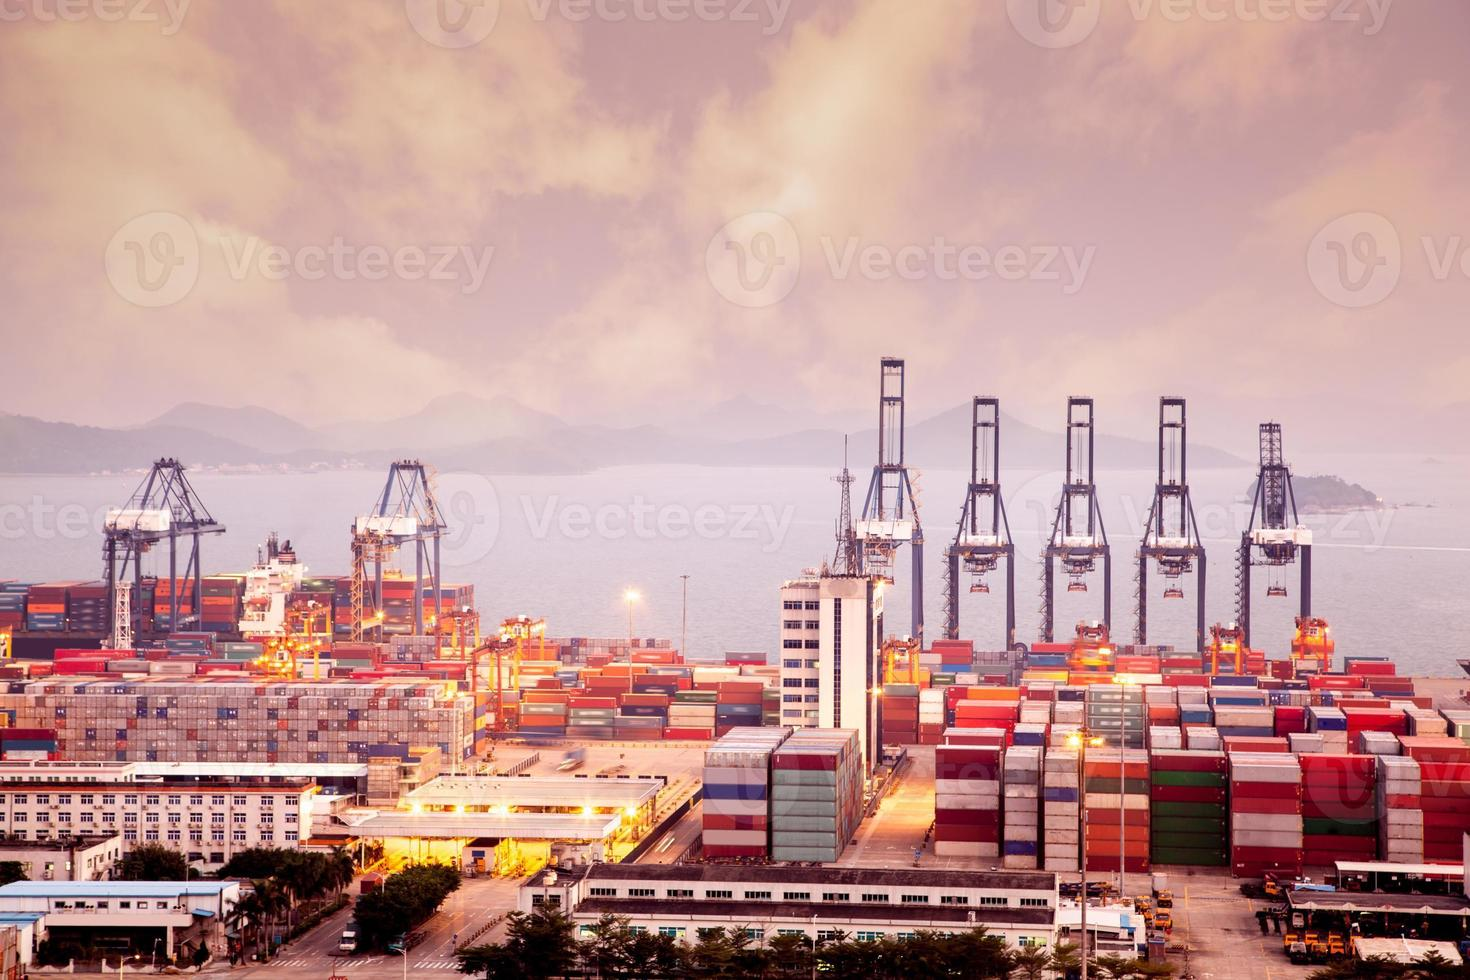 China Shenzhen, Yantian Port photo